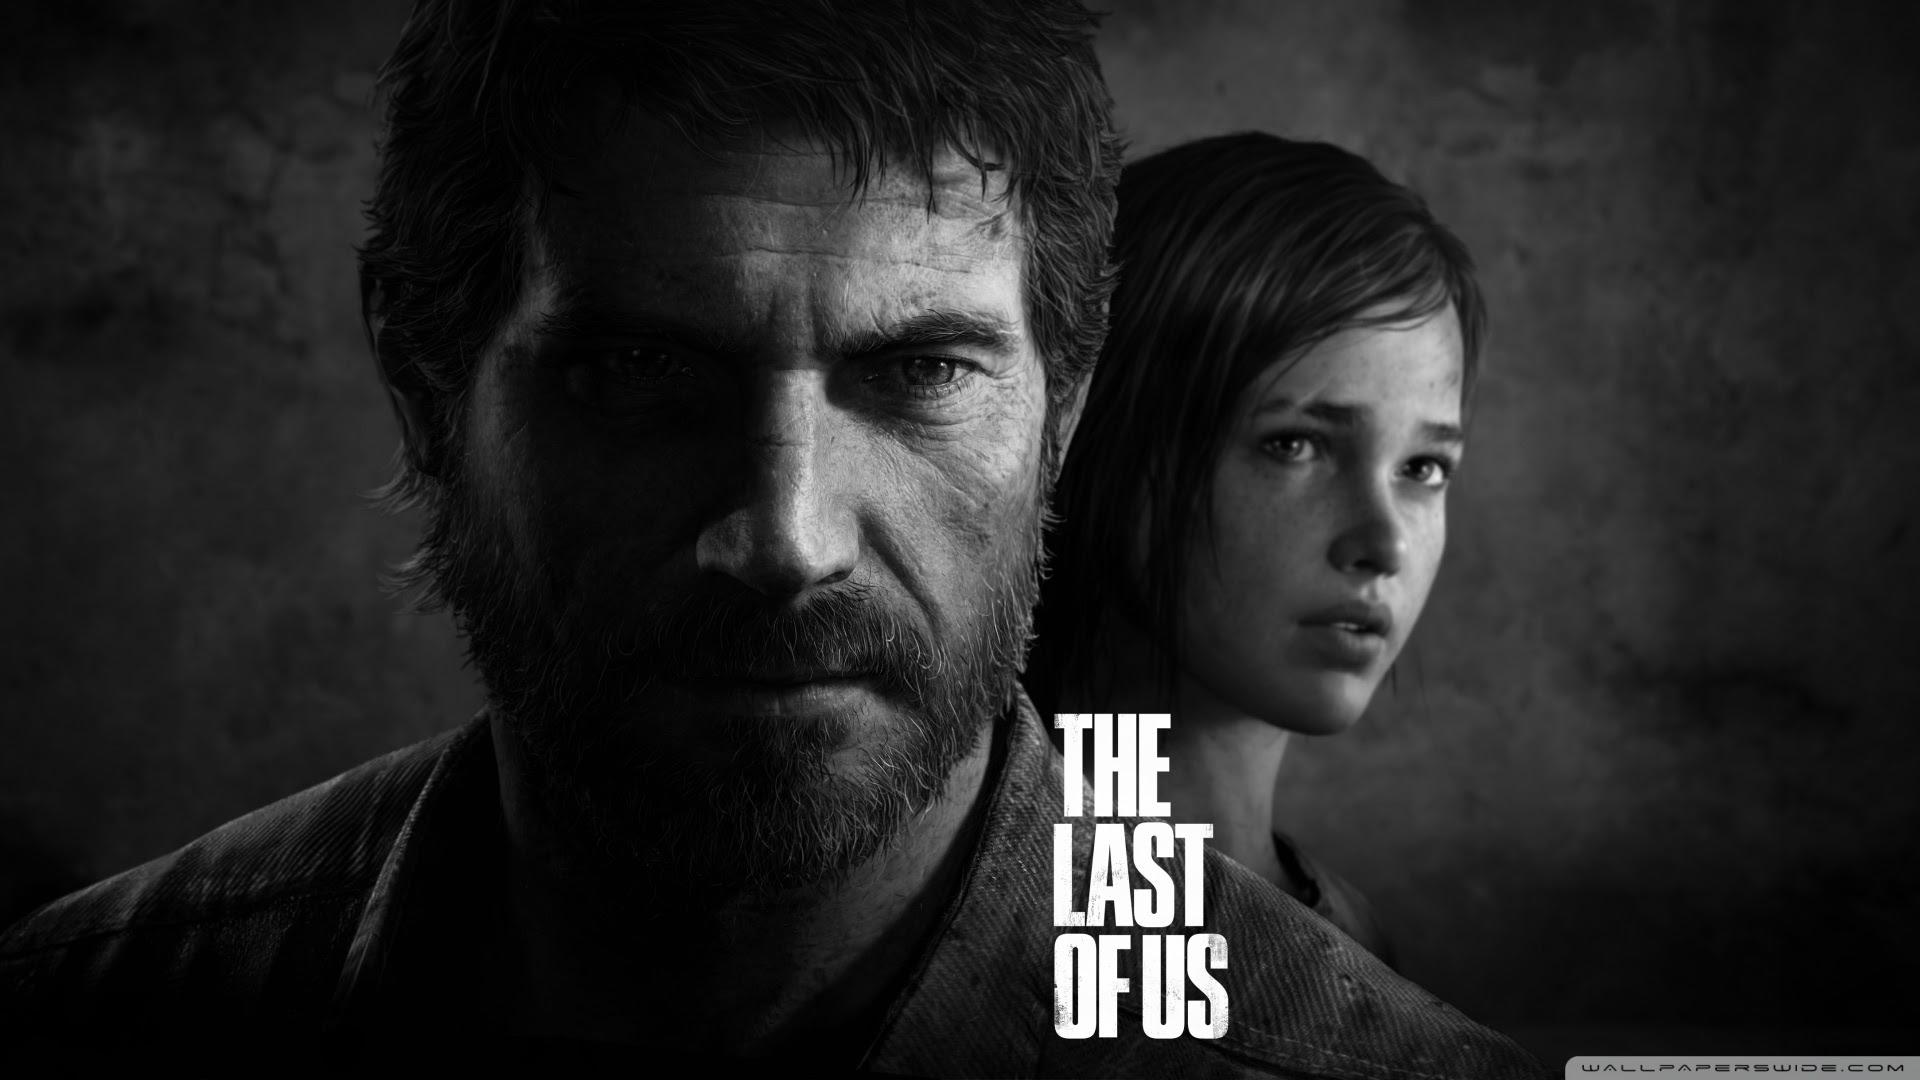 The Last Of Us Ultra Hd Desktop Background Wallpaper For 4k Uhd Tv